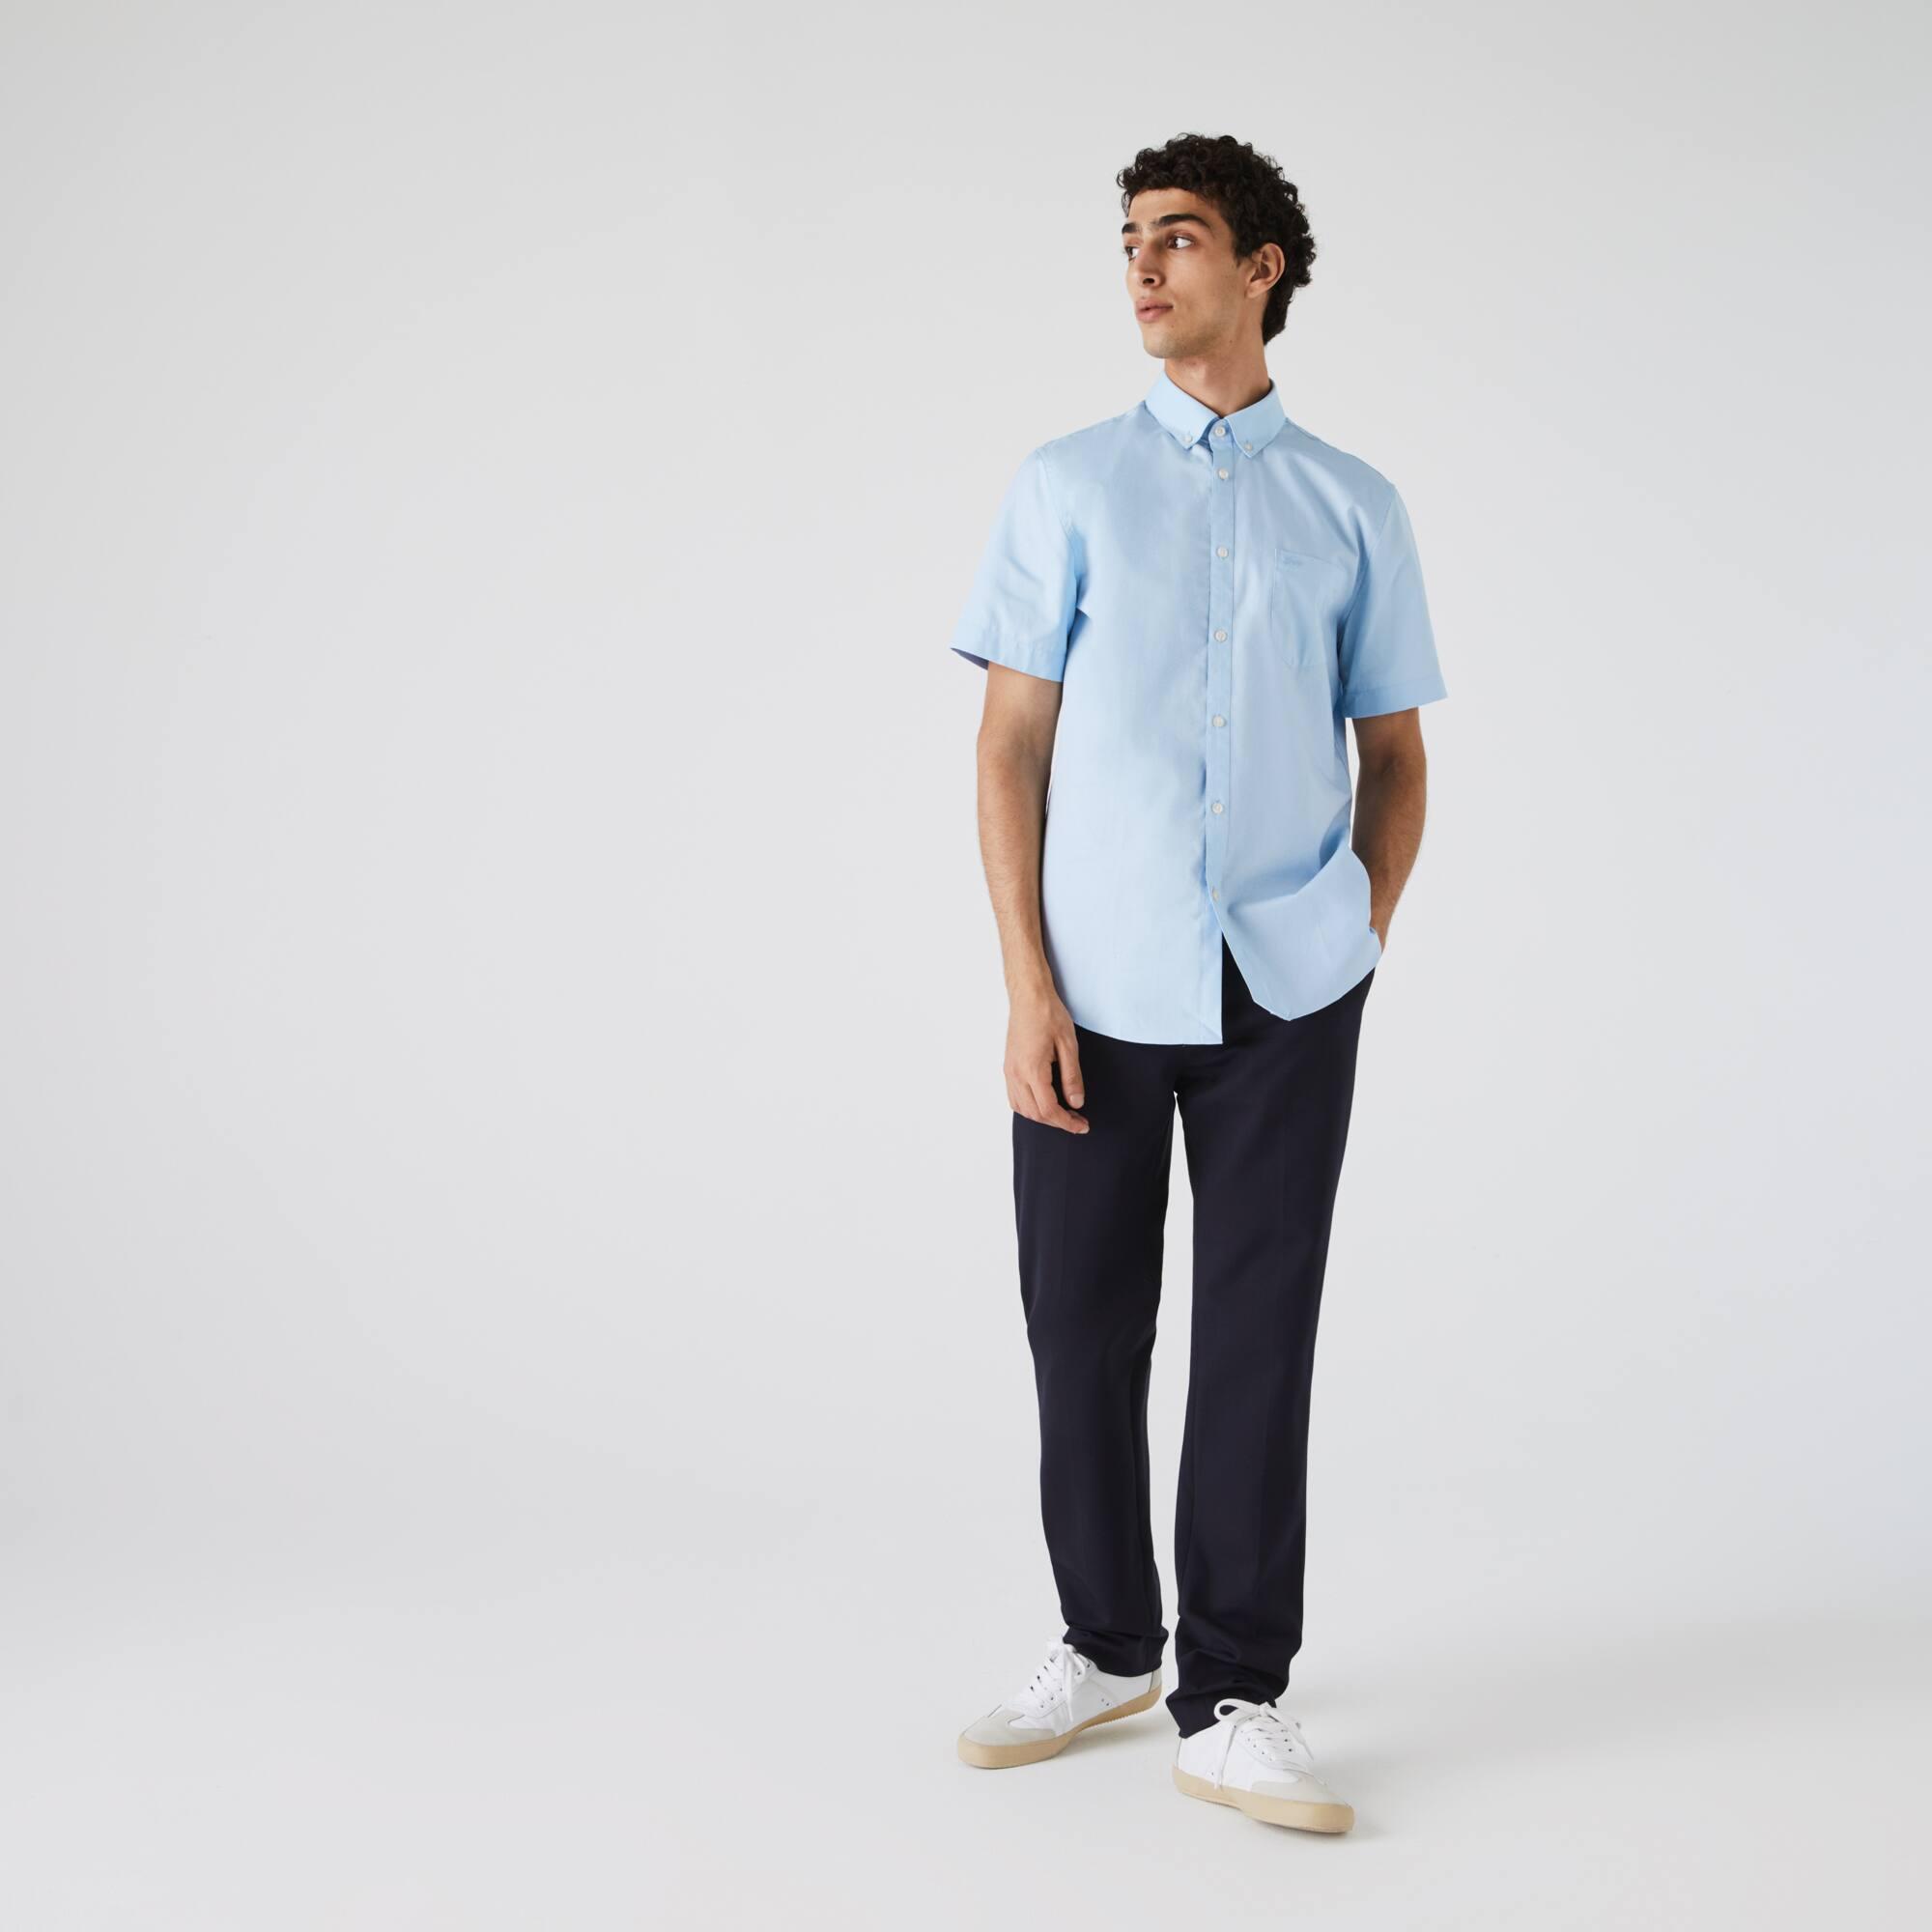 804202ba1 Polo shirts, shoes, leather goods   LACOSTE Online Boutique